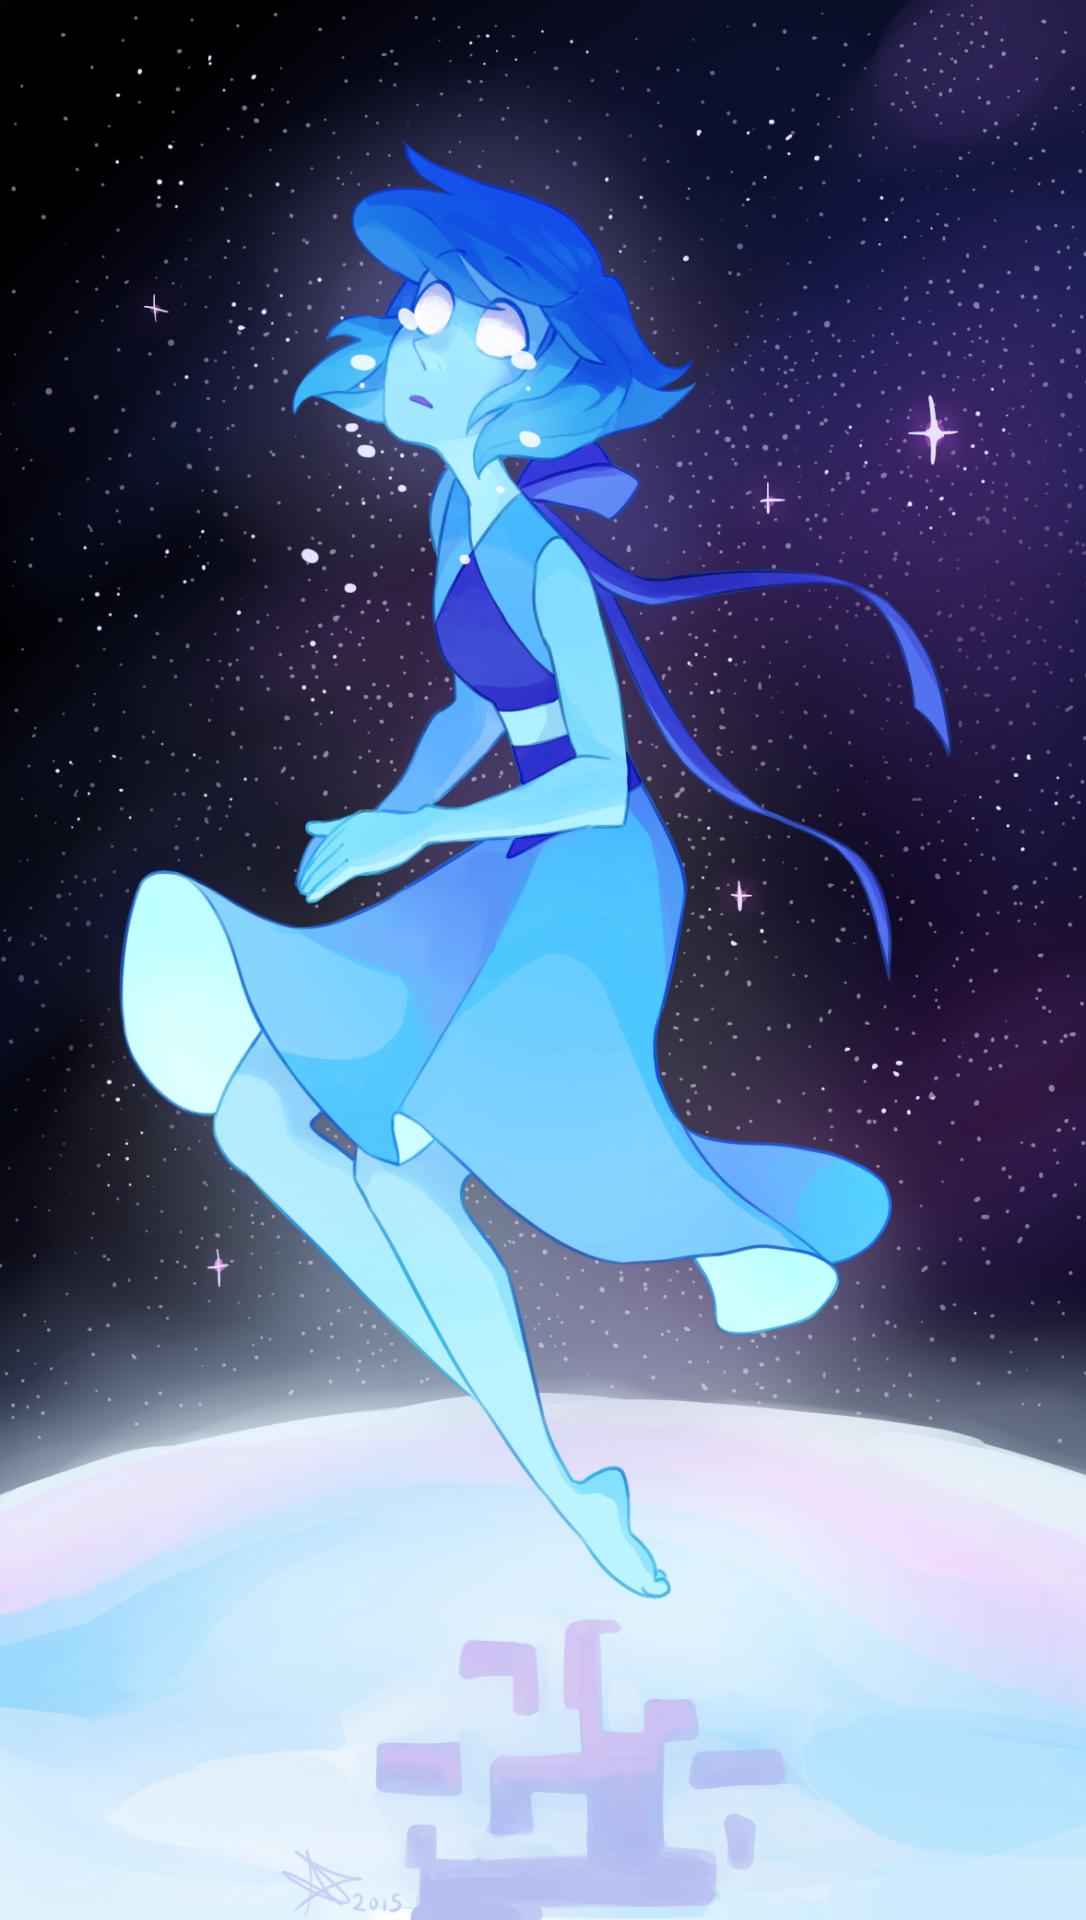 Universe iphone wallpaper tumblr - Explore Art Beat Lapis Lazuli Steven Universe And More